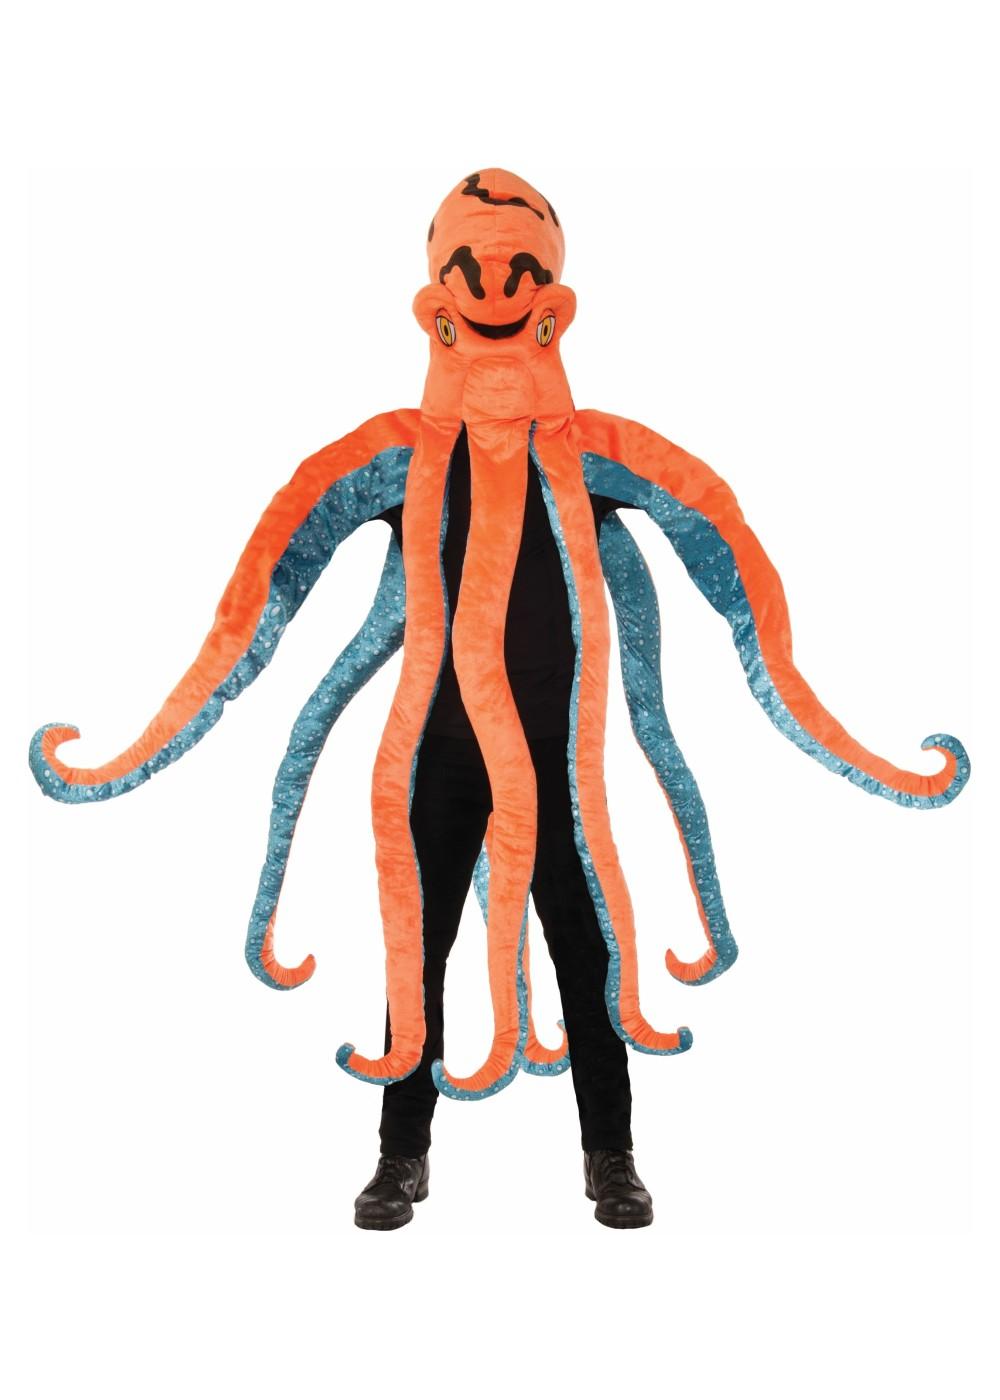 Octopus Mascot Costume - Mascot Costumes